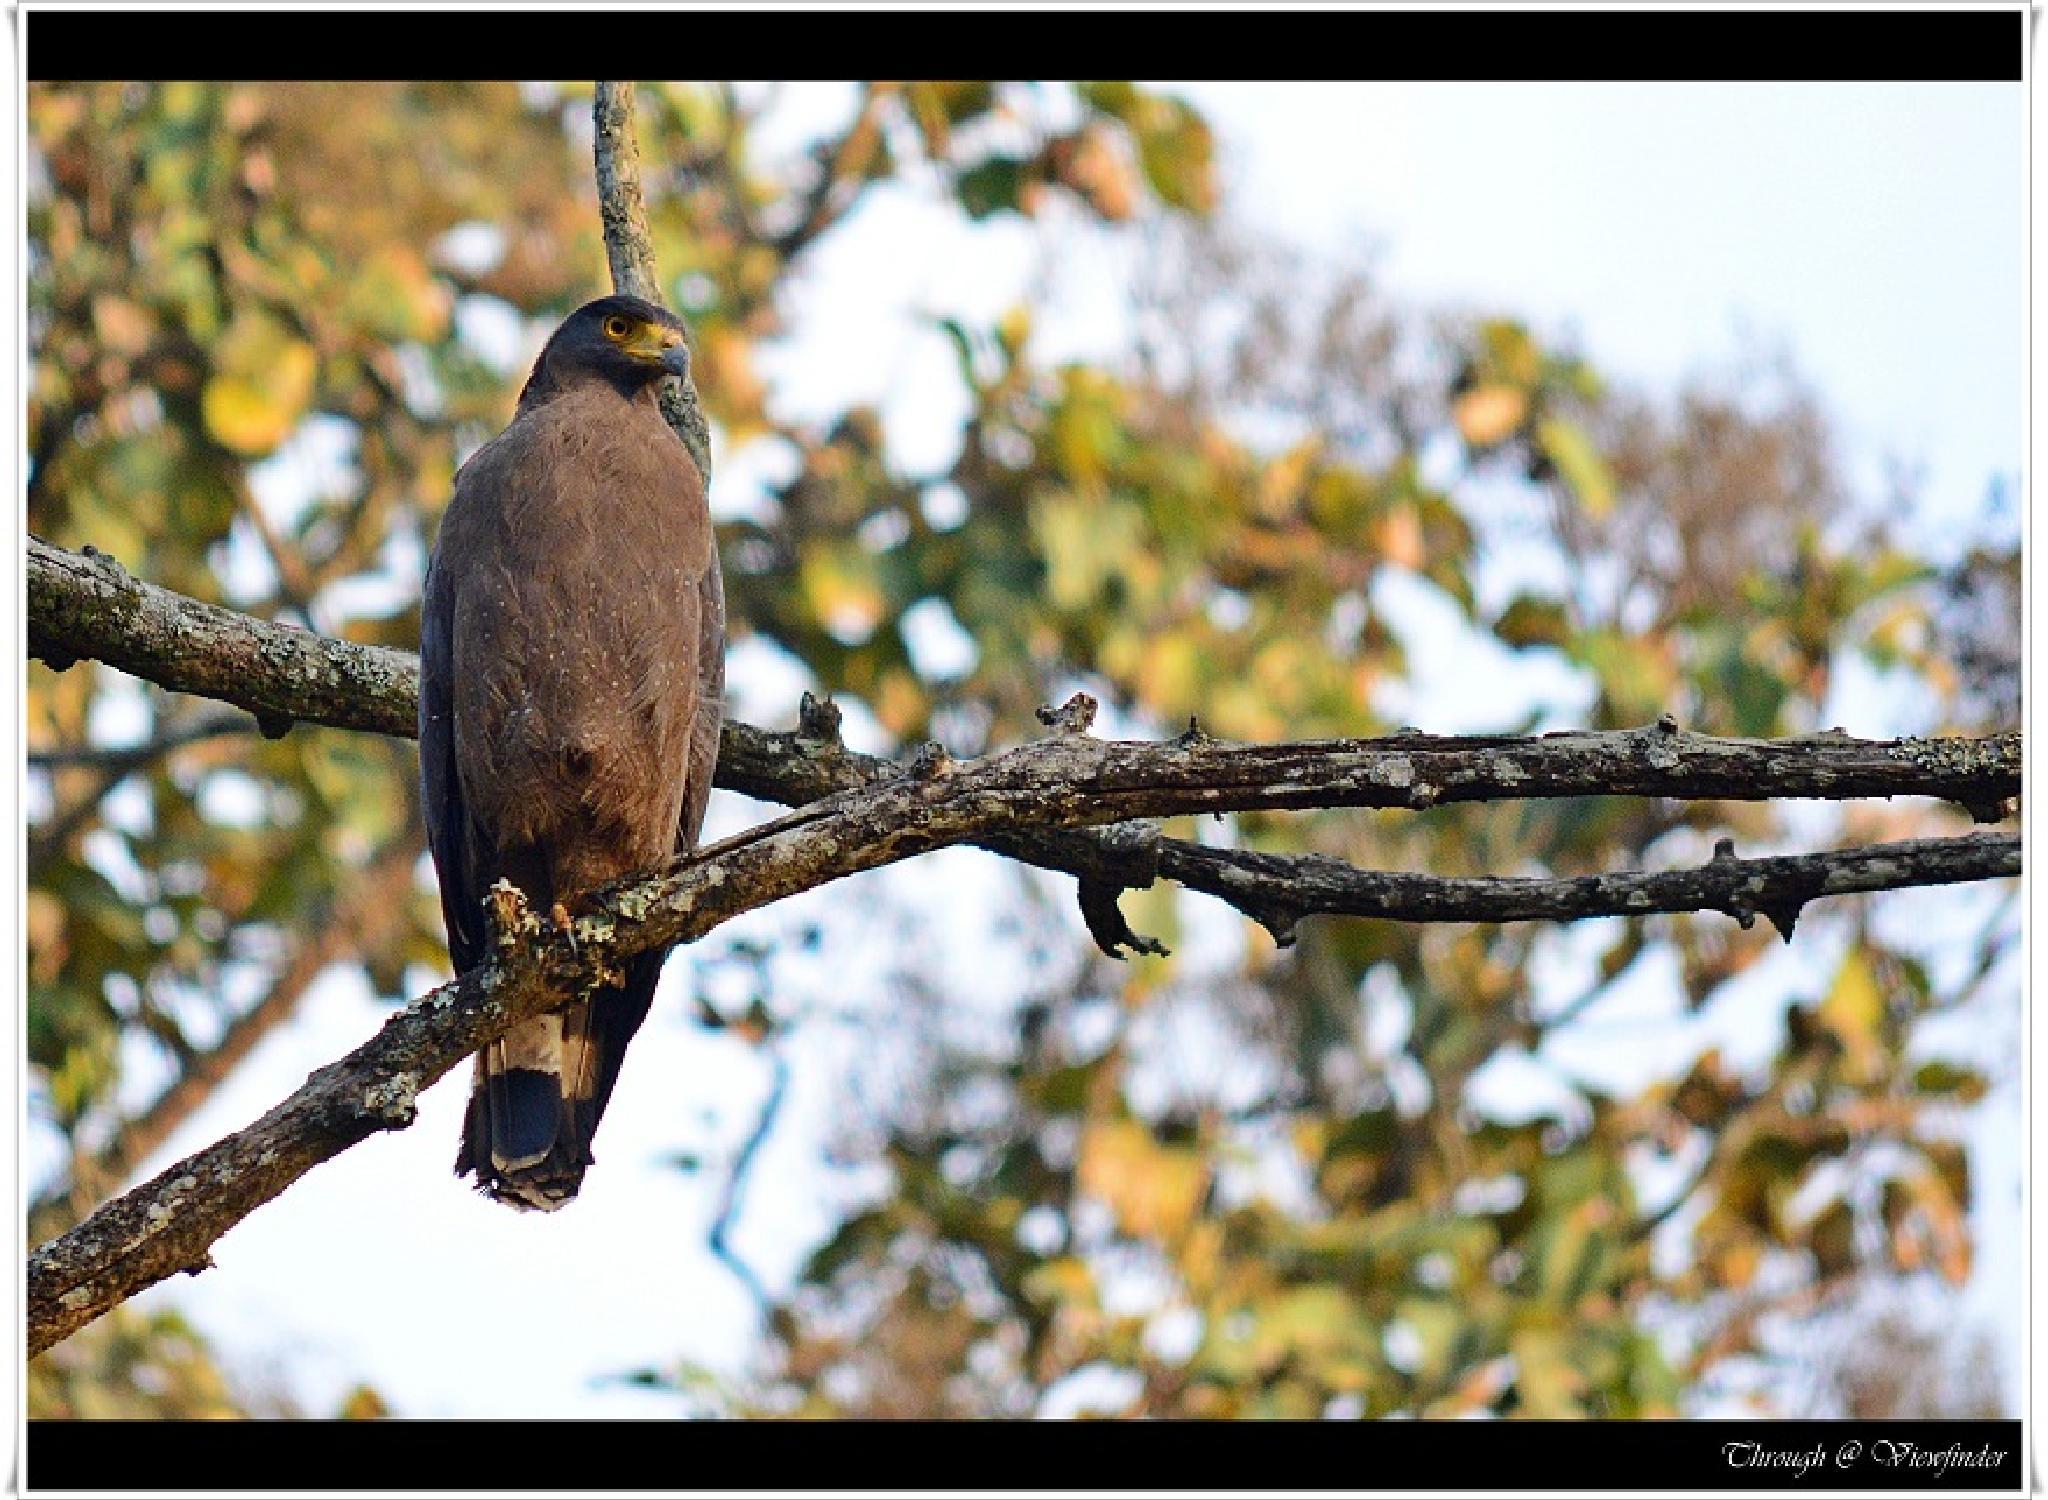 Crested Serpent Eagle by prashobh.ailyam